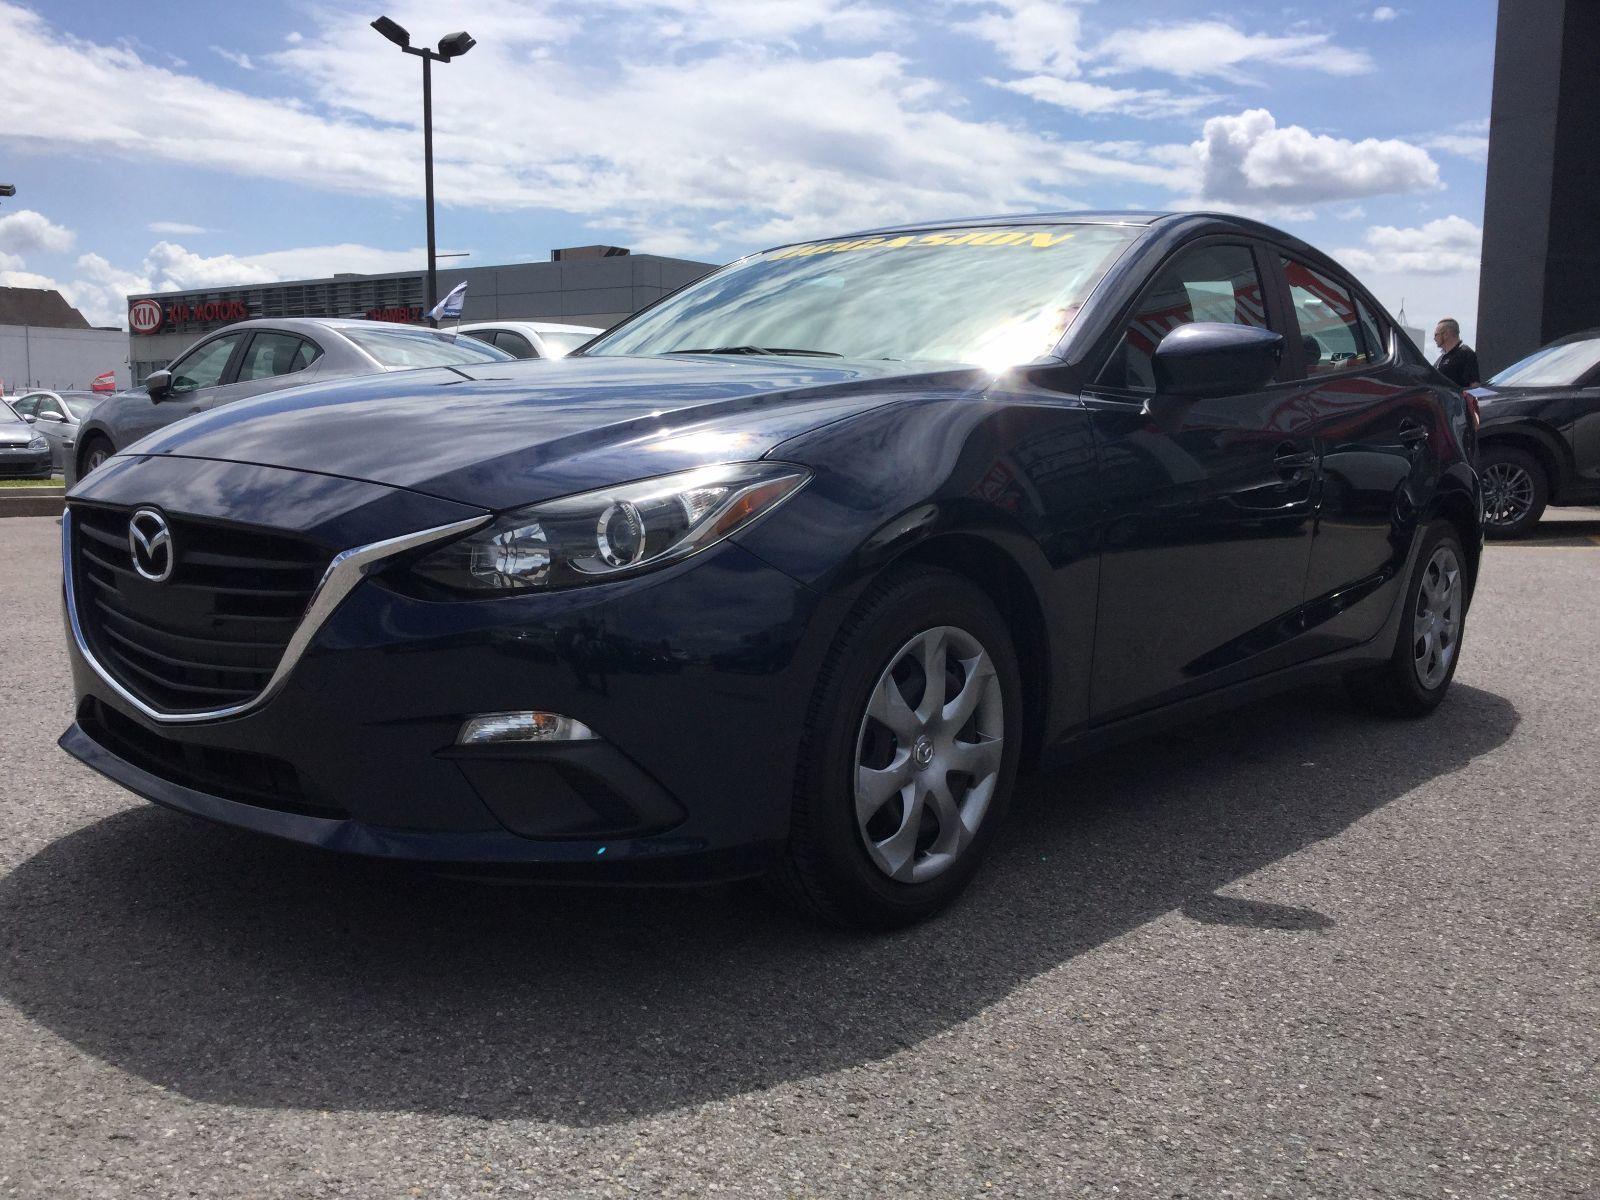 Mazda Mazda3 **RÉSERVÉ**, GX-SKY TAUX INTÉRÊT À PARTIR DE 0.9% 2014 AC, BLUETOOTH,GARANTIE JUSQU EN 2019